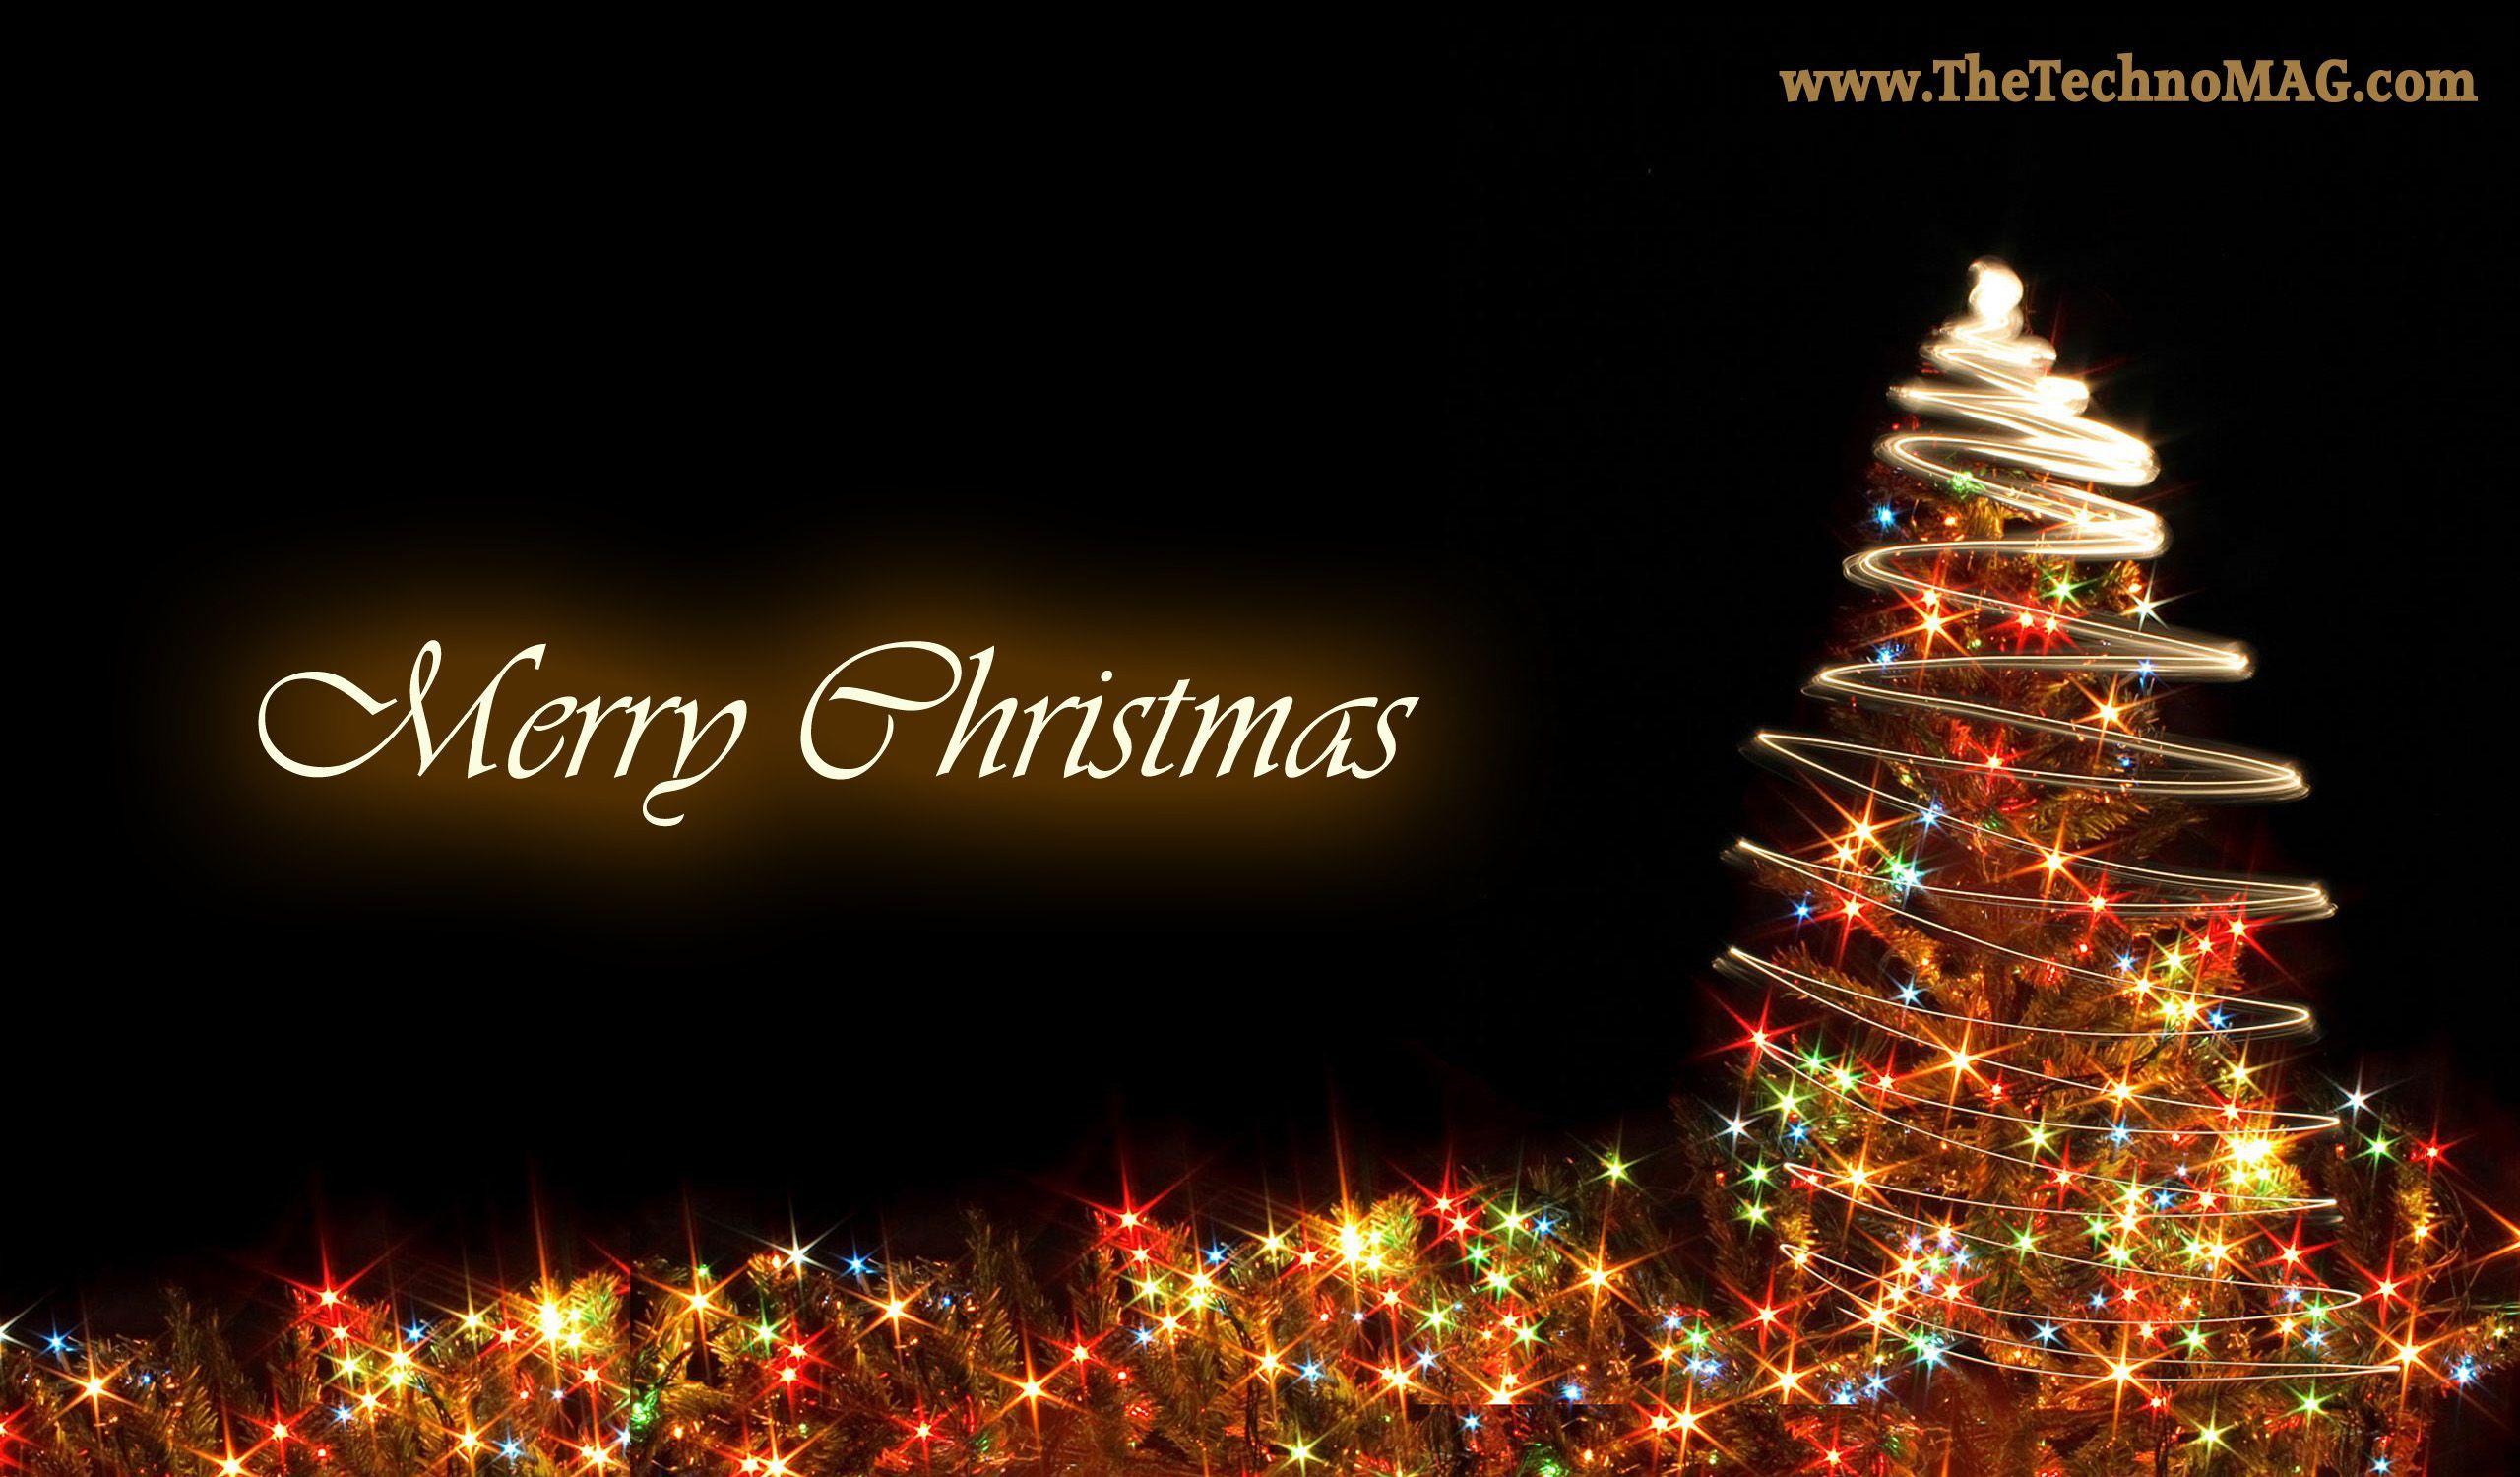 merry christmas wallpaper christmas desktop wallpapers - Merry Christmas Wallpapers